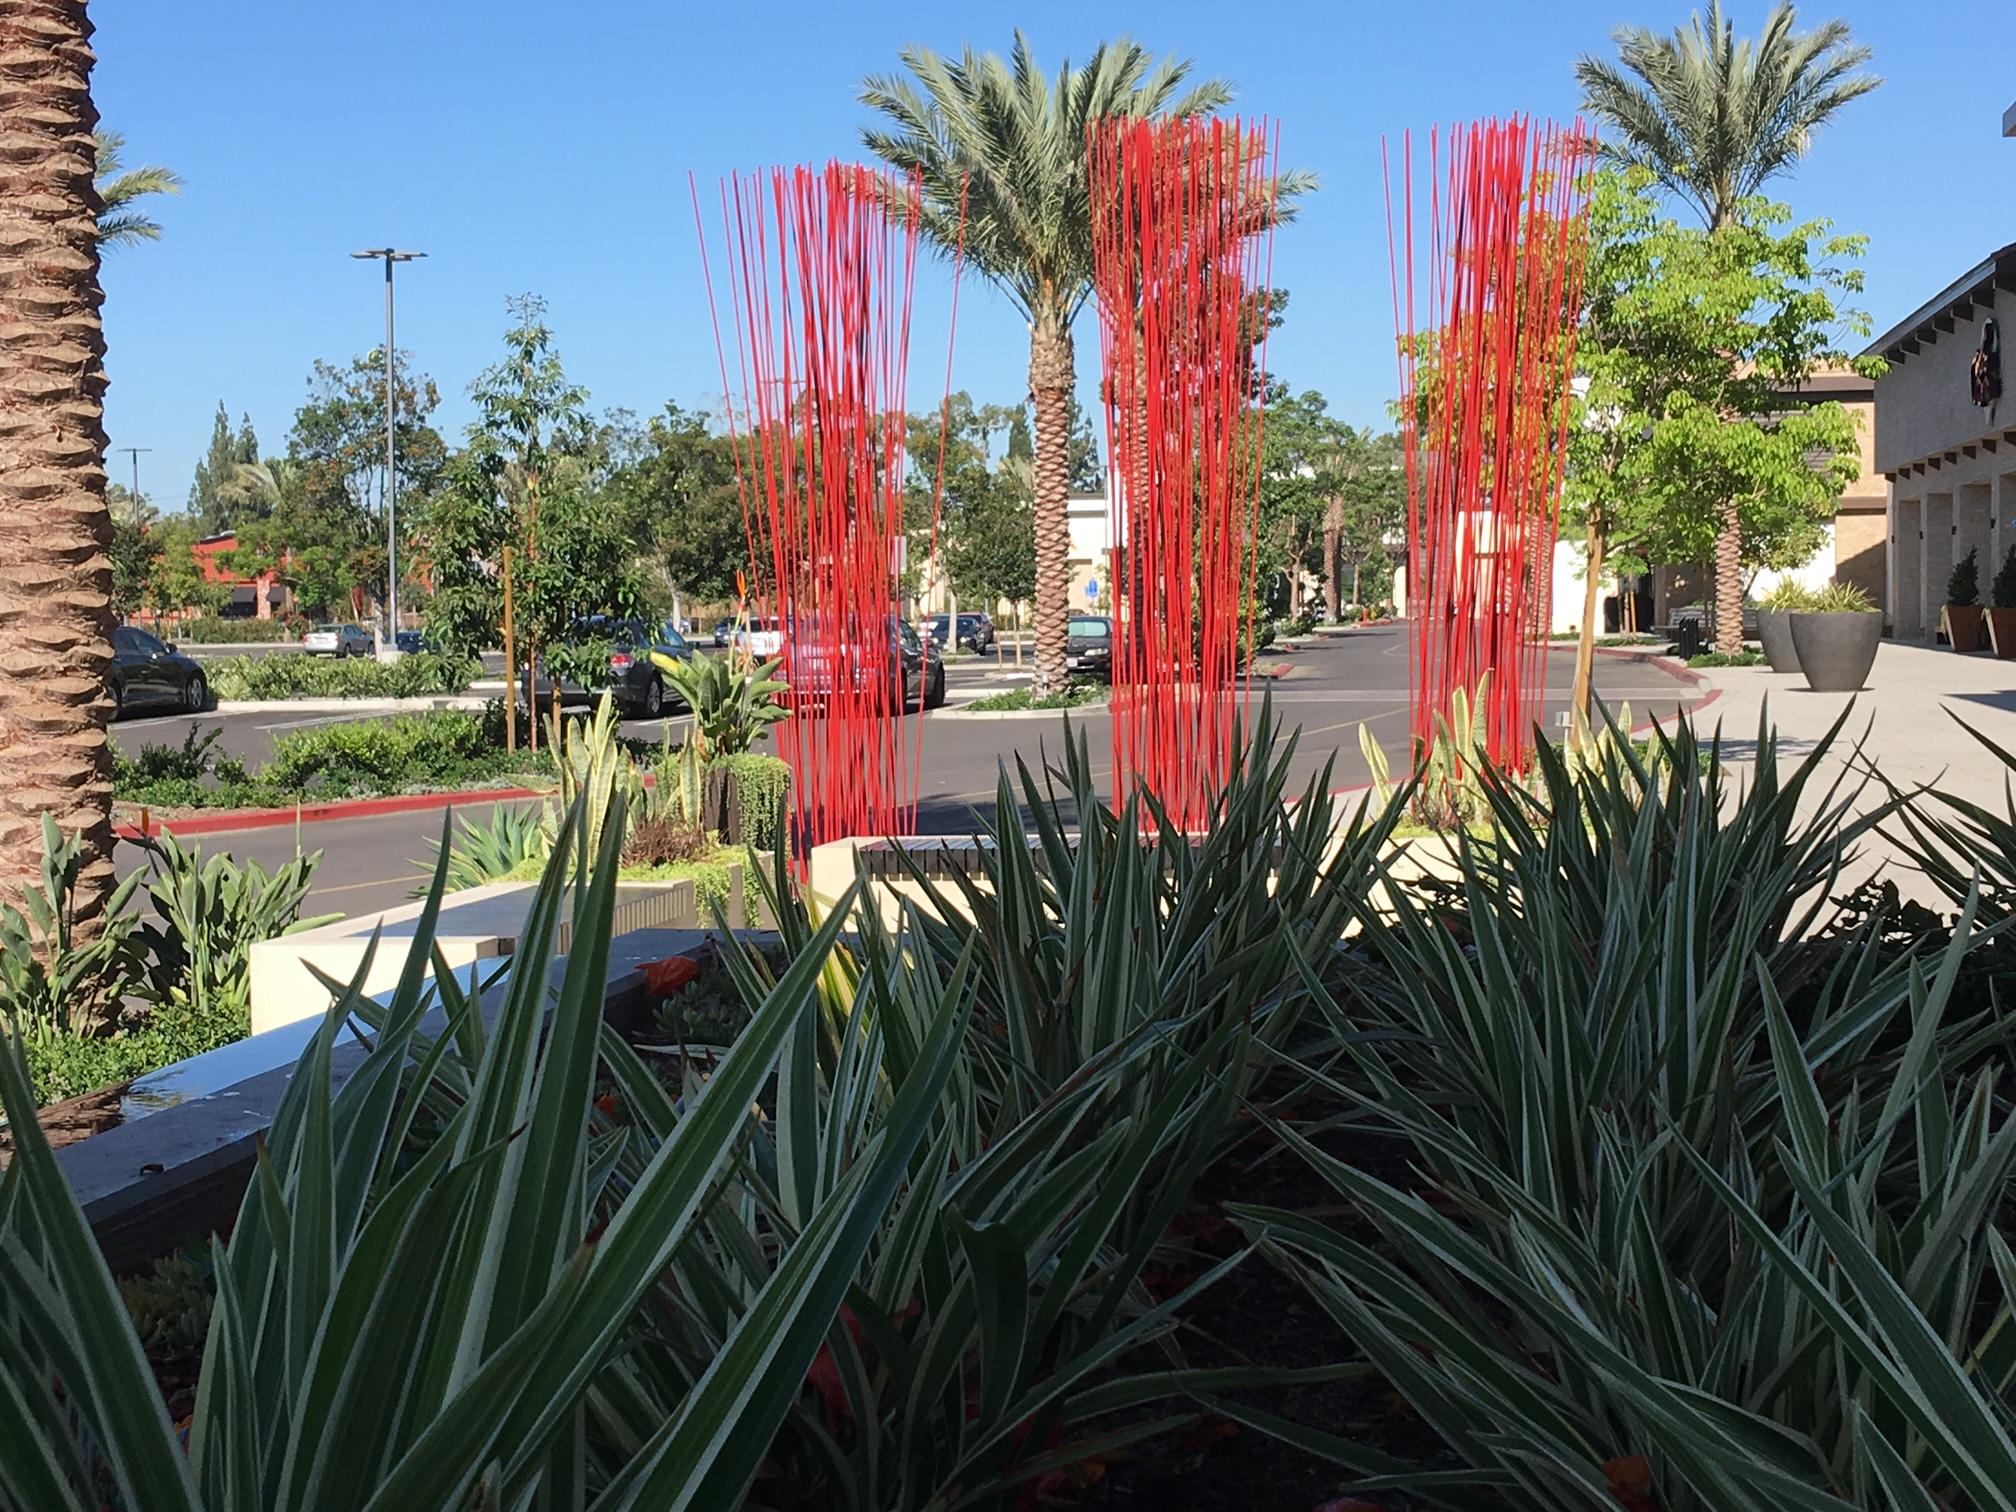 Kon Dimopoulous, CenterCal Plaza 183, Cerritos, CA